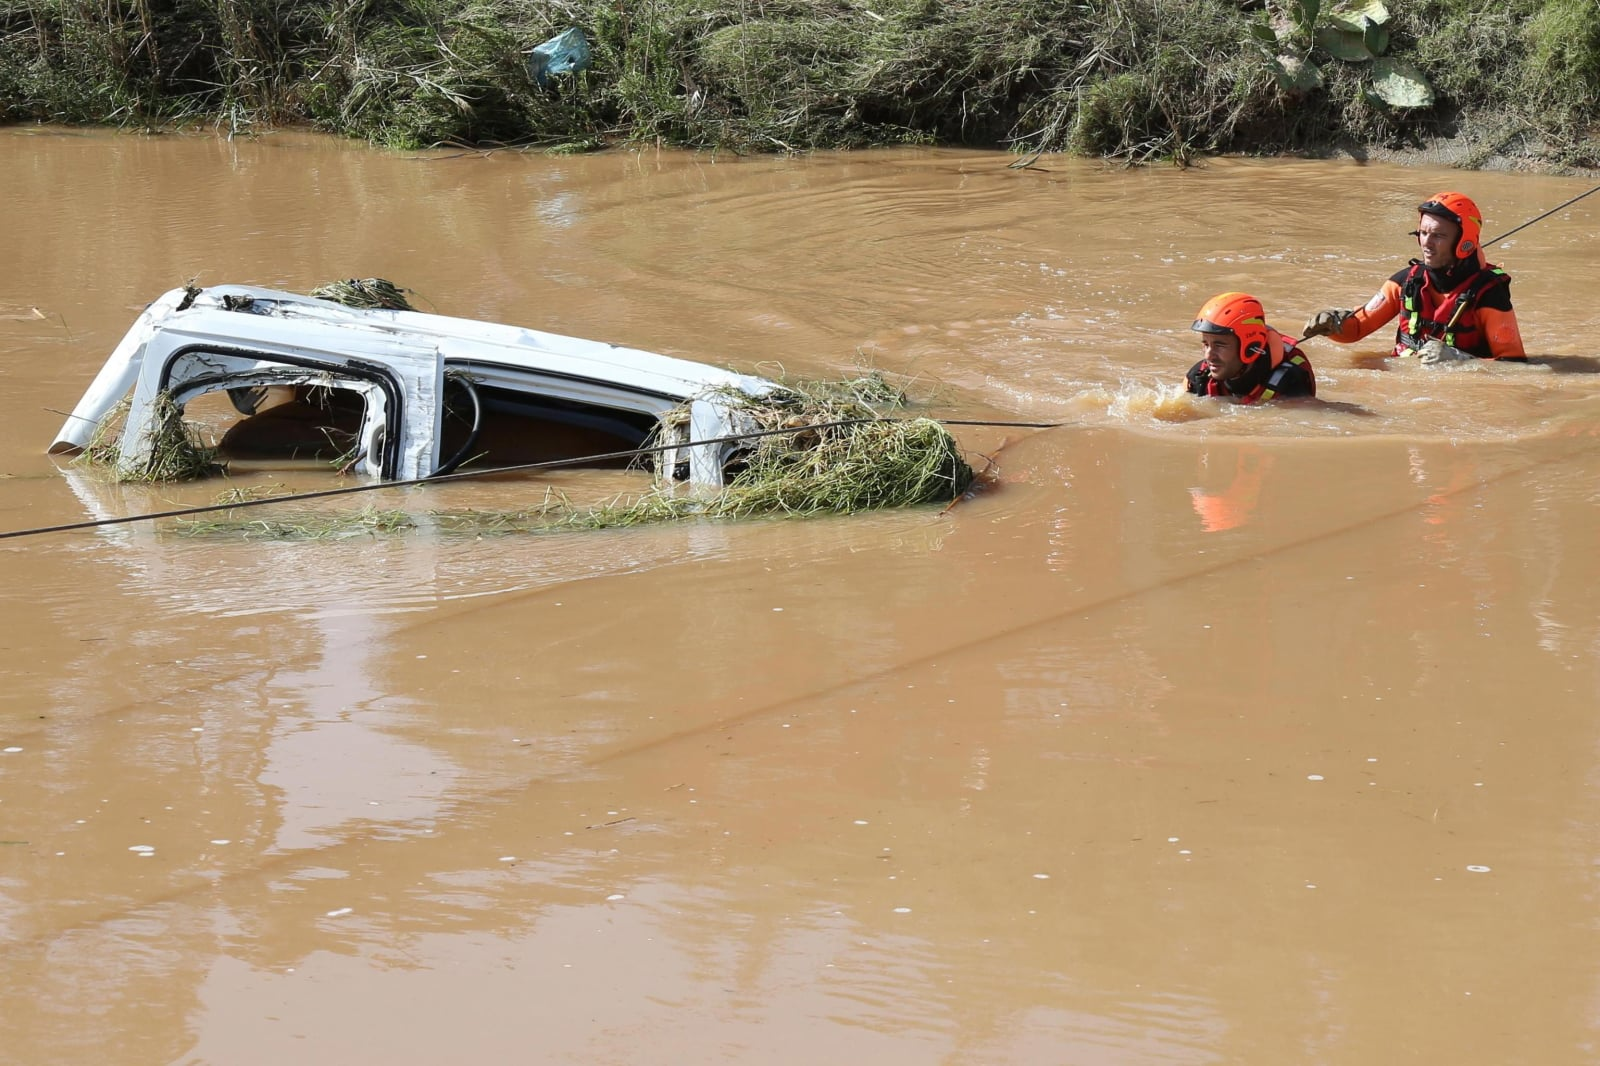 Powódź w Hiszpanii fot. EPA/FABIO MURRU